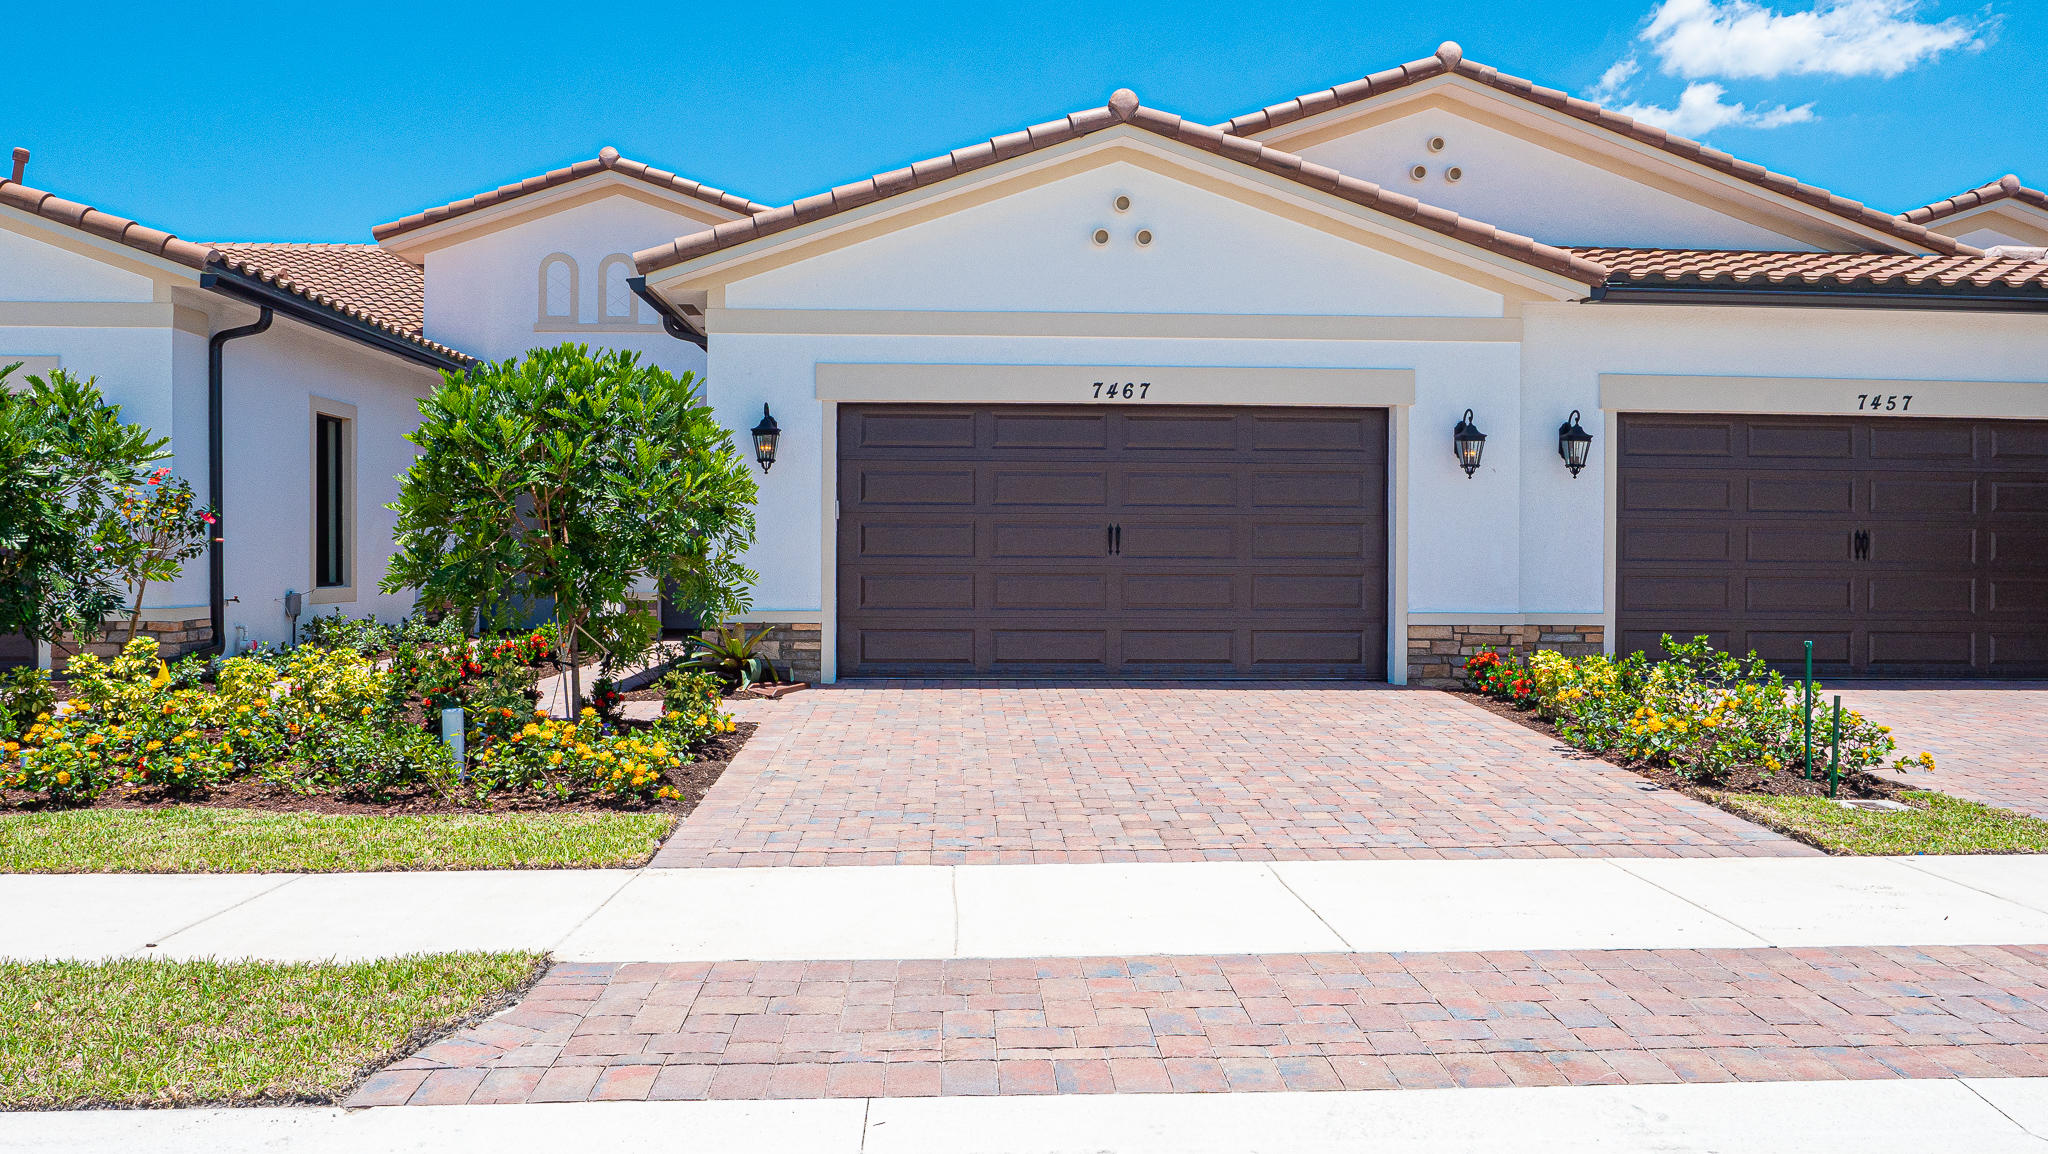 Photo of 7467 S Blue Spring Drive, Parkland, FL 33067